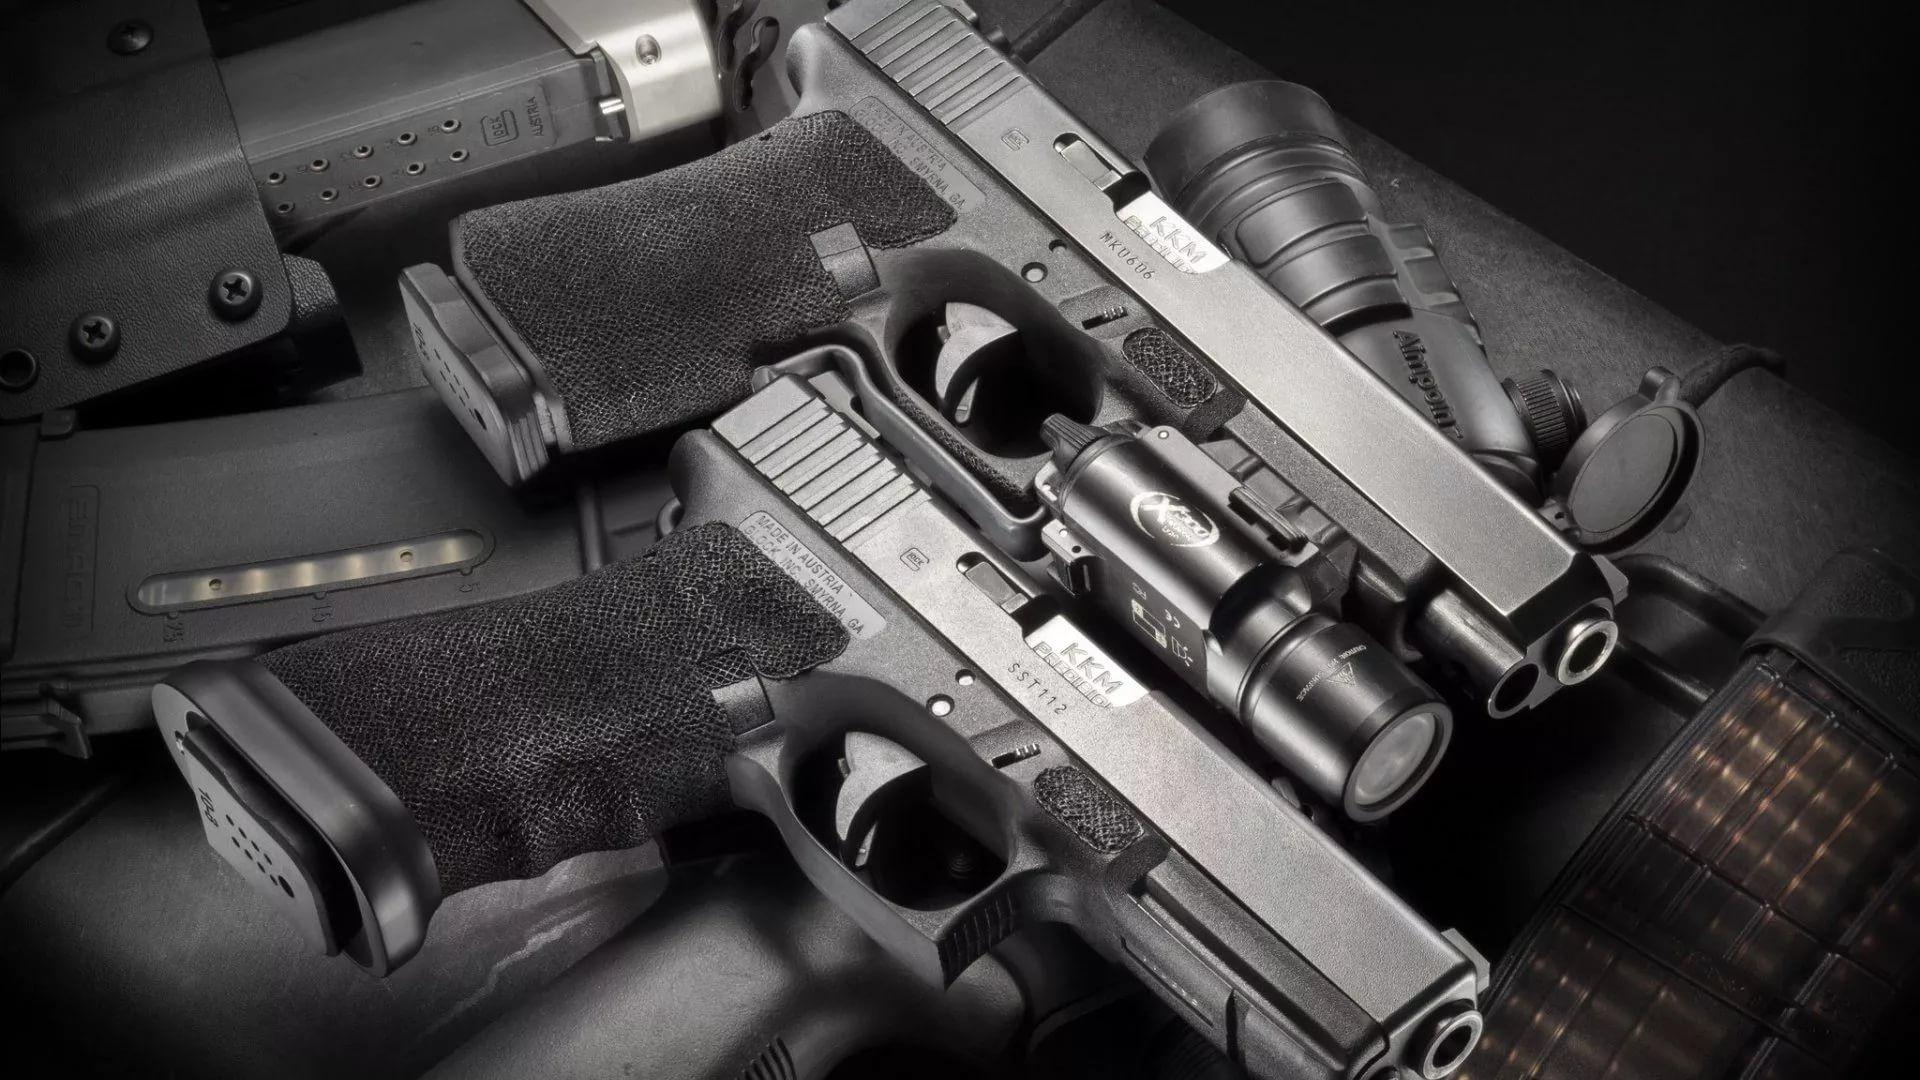 Gun For Desktop background wallpaper